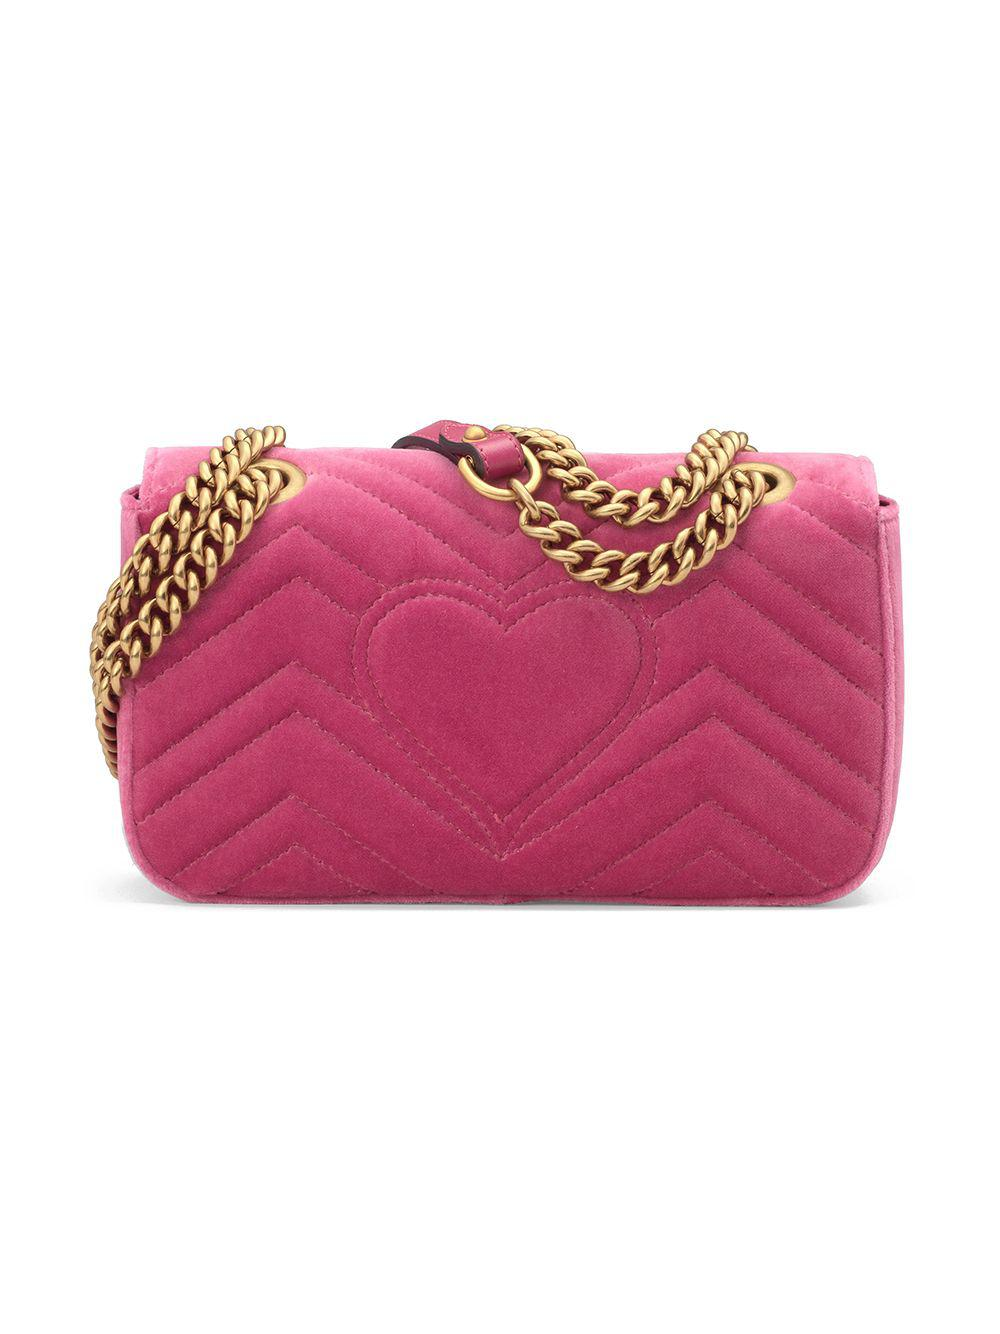 6faa81cd9d2 Lyst - Gucci GG Marmont Velvet Mini Bag in Pink